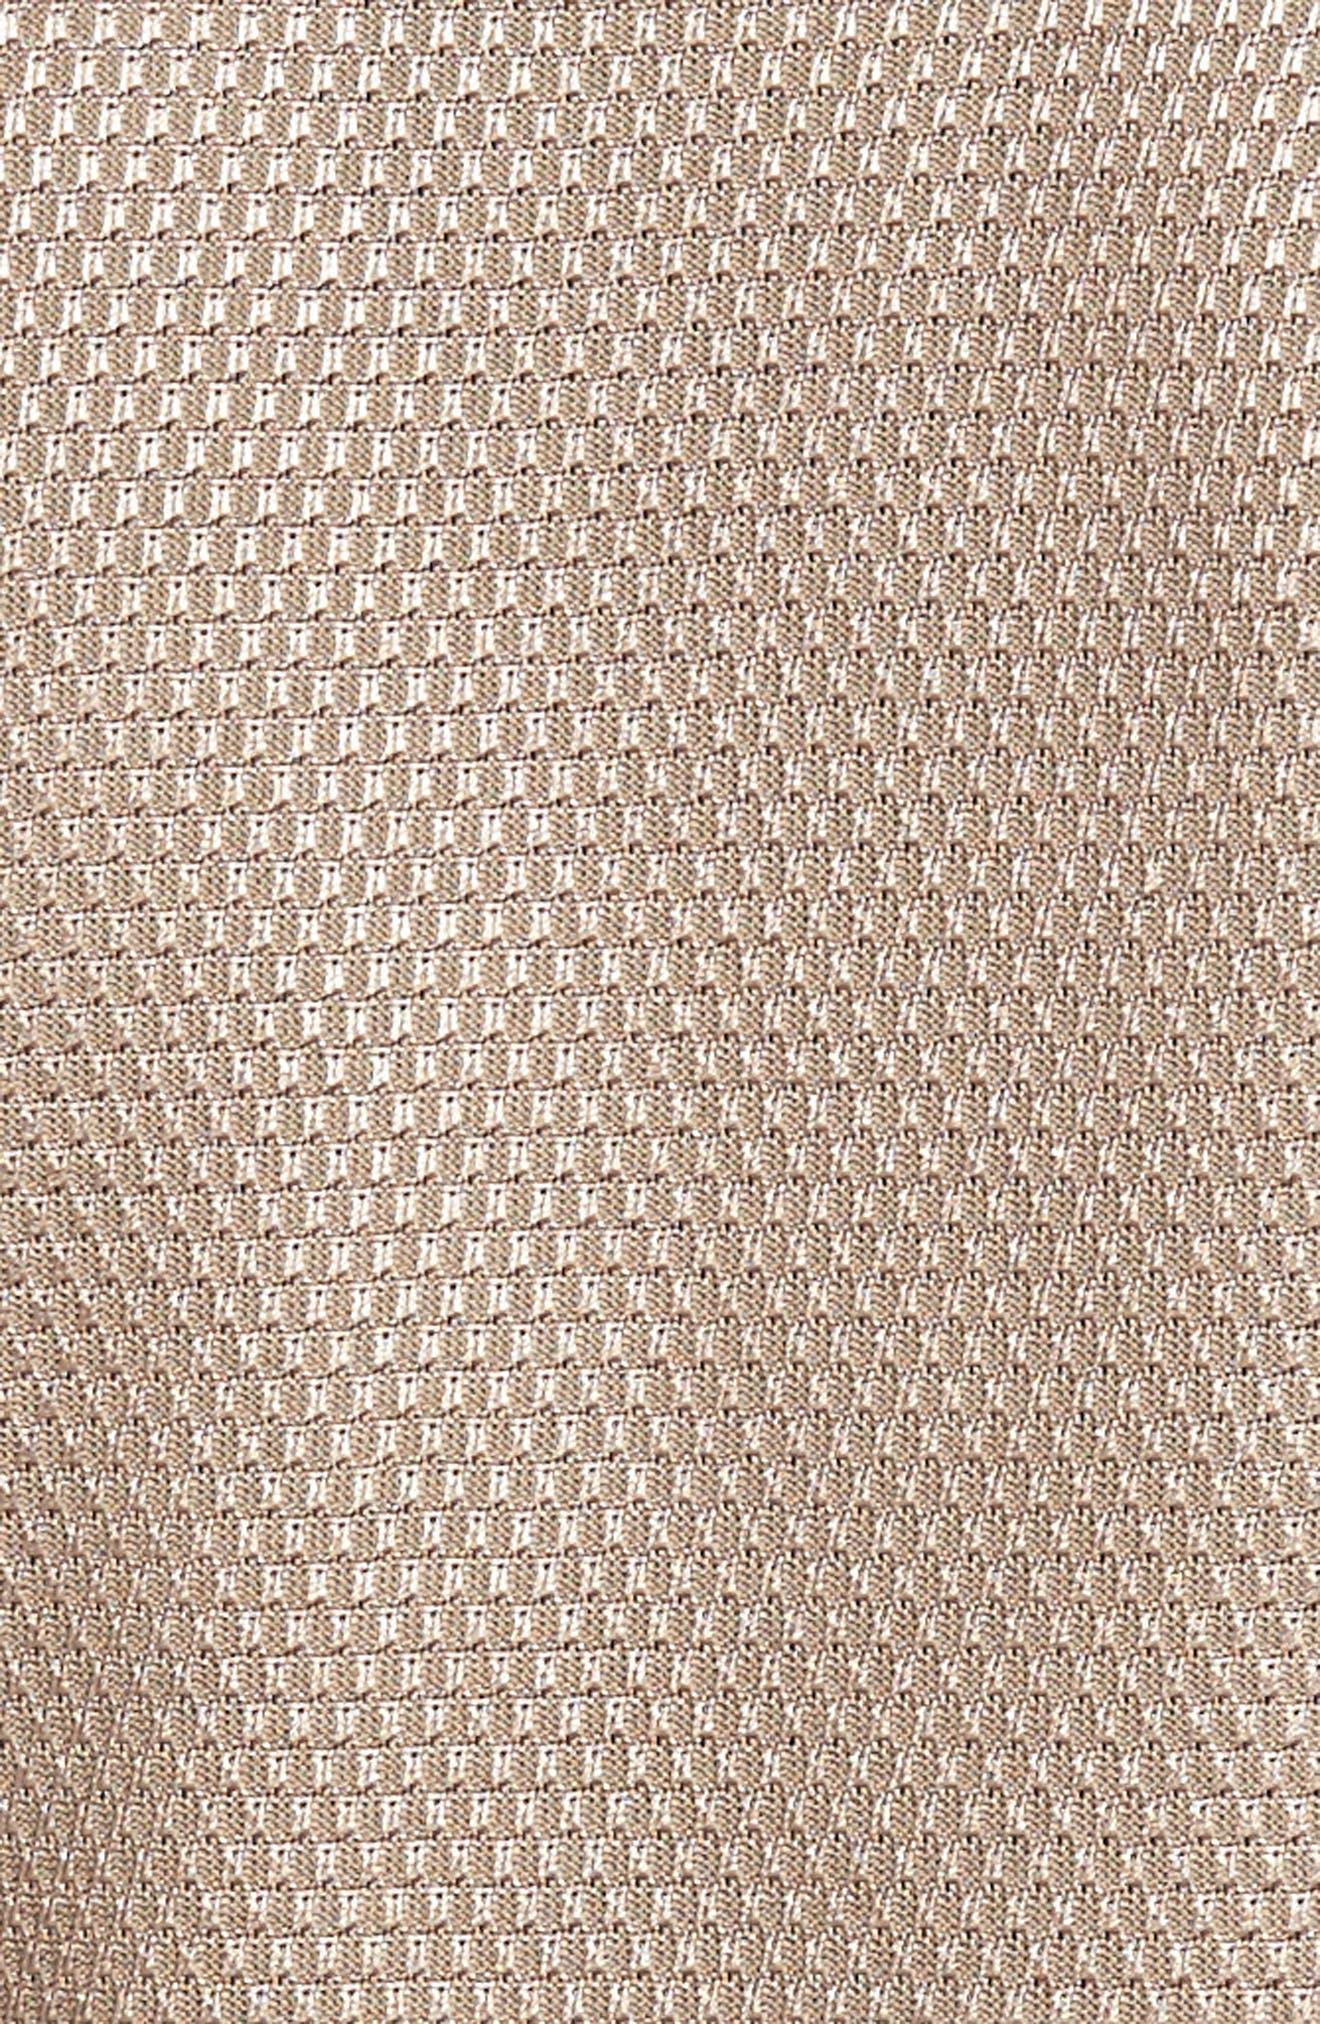 Textured Knit Jacket,                             Alternate thumbnail 6, color,                             250